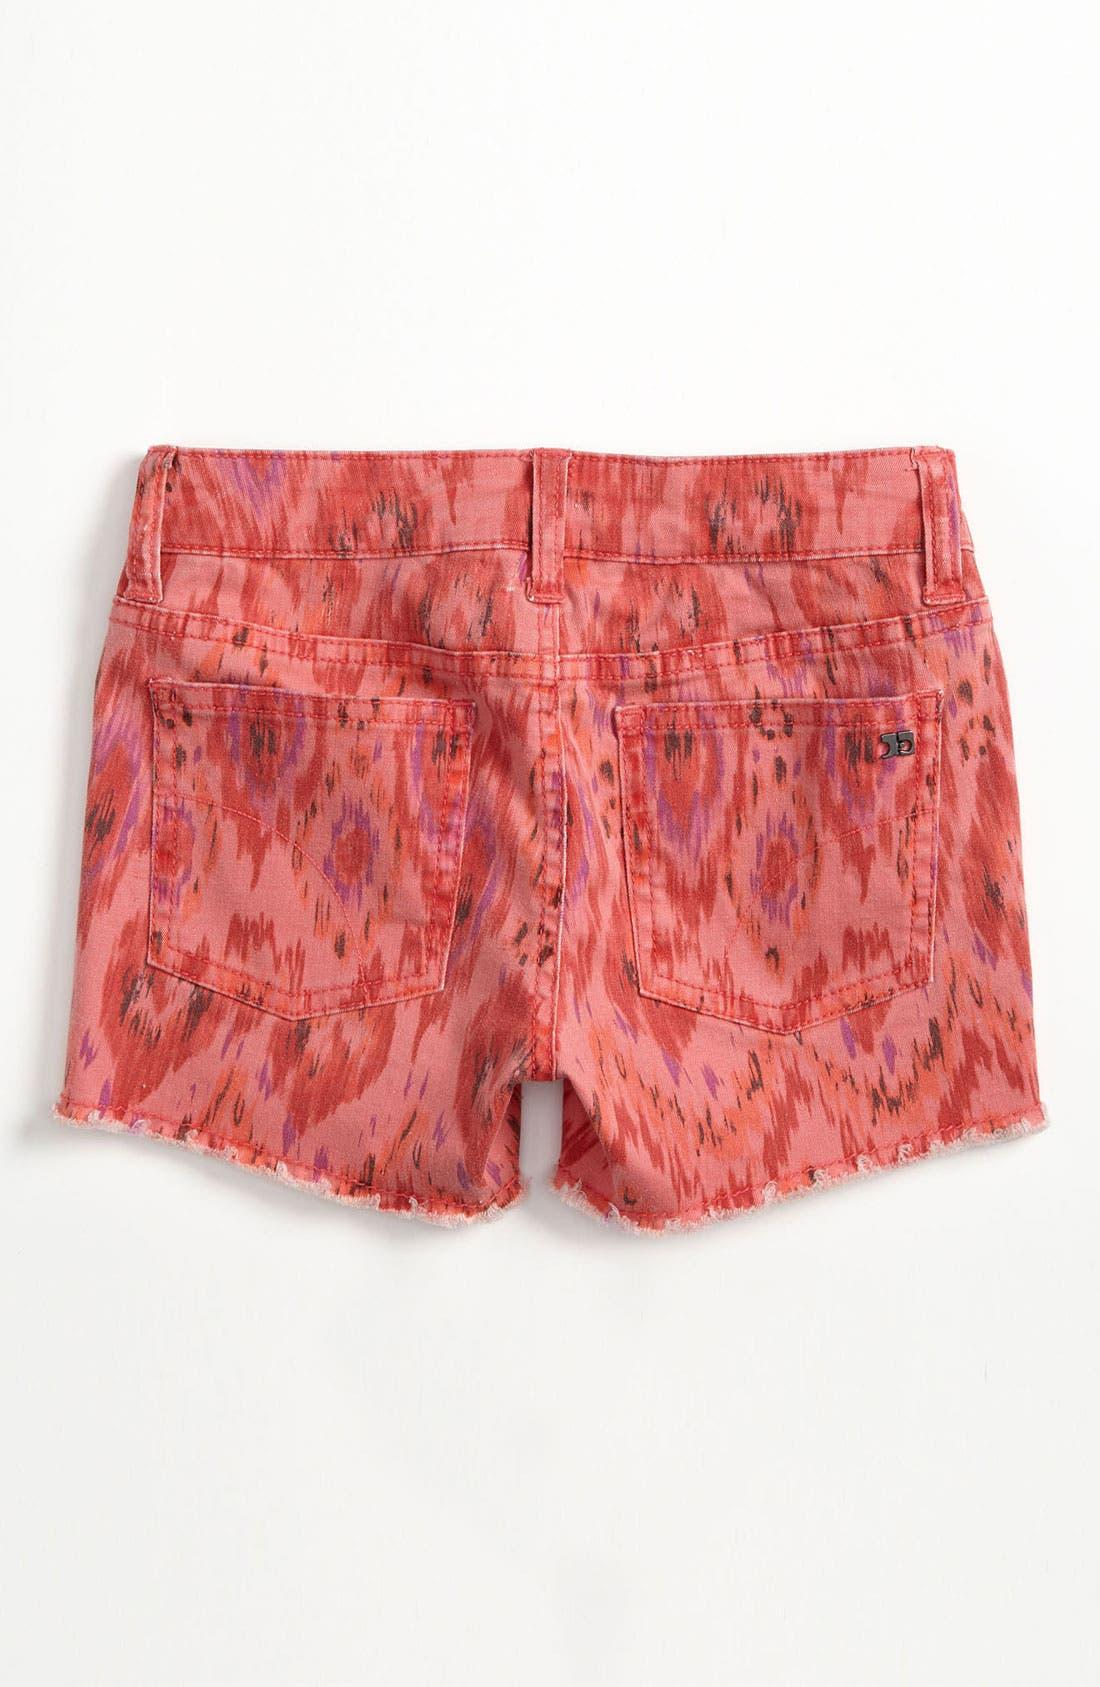 Alternate Image 1 Selected - Joe's Print Shorts (Big Girls)